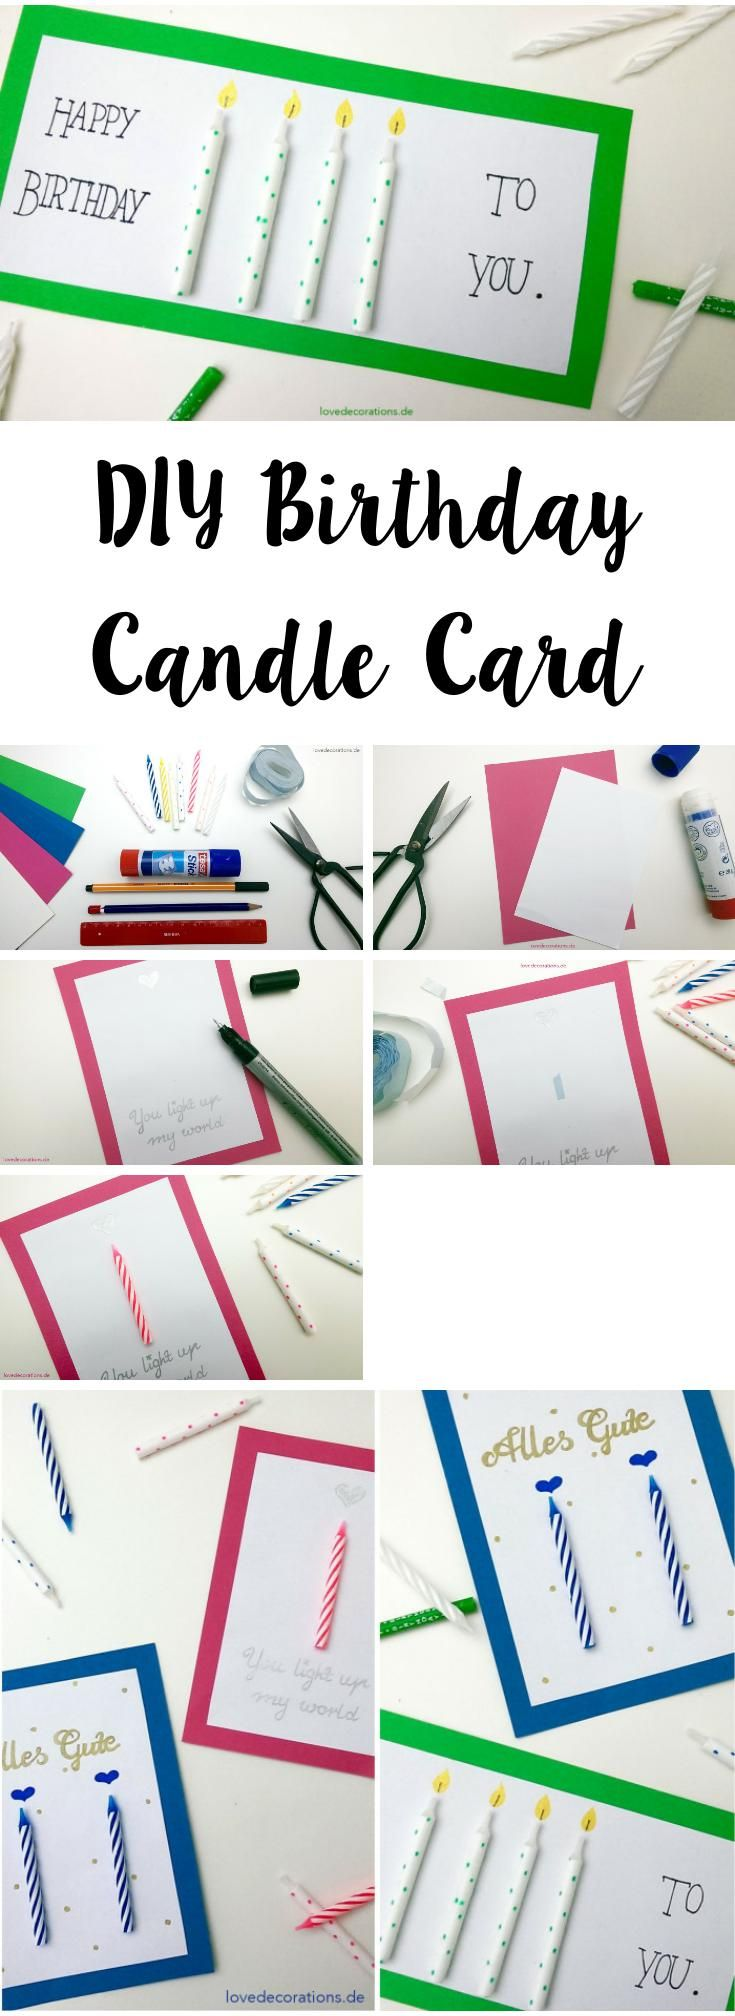 DIY Geburtstagskerze Karte | DIY Birthday Candle Card